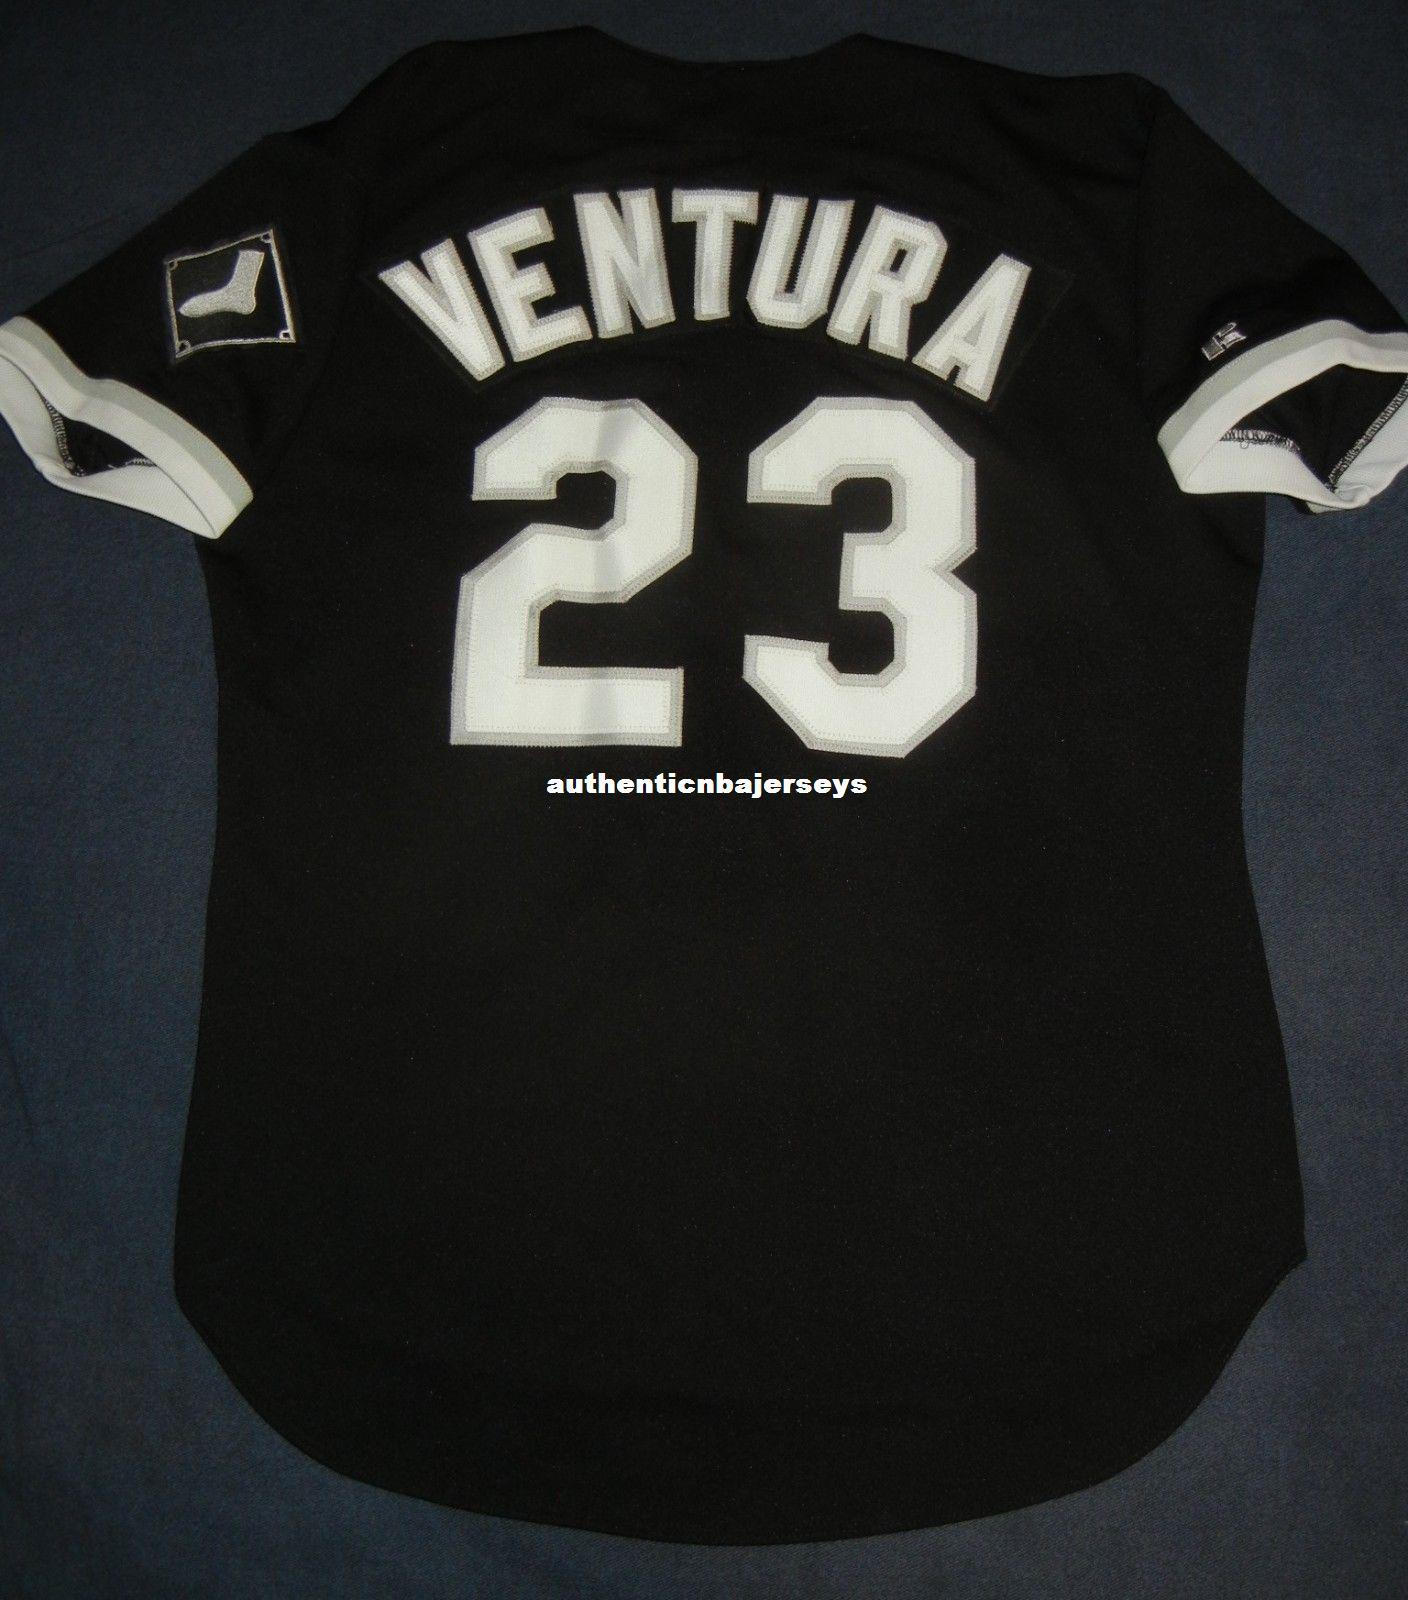 Rétro pas cher # 23 ROBIN VENTURA Top Russell Athletic CHICAGO Noir Jersey 44 Hommes Maillots de Baseball Cousus